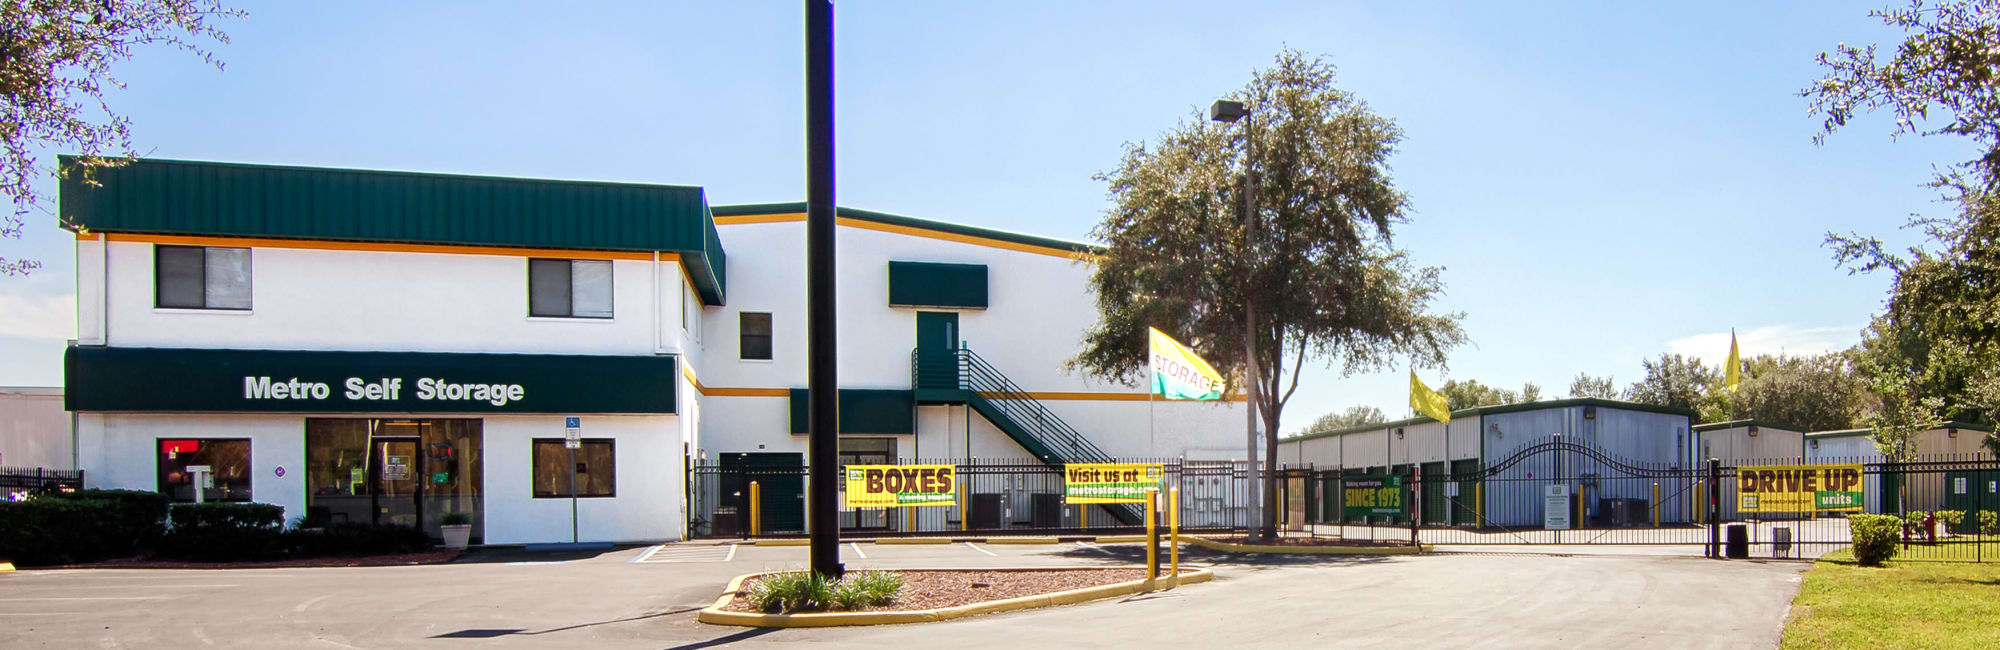 Metro Self Storage in Tampa, FL